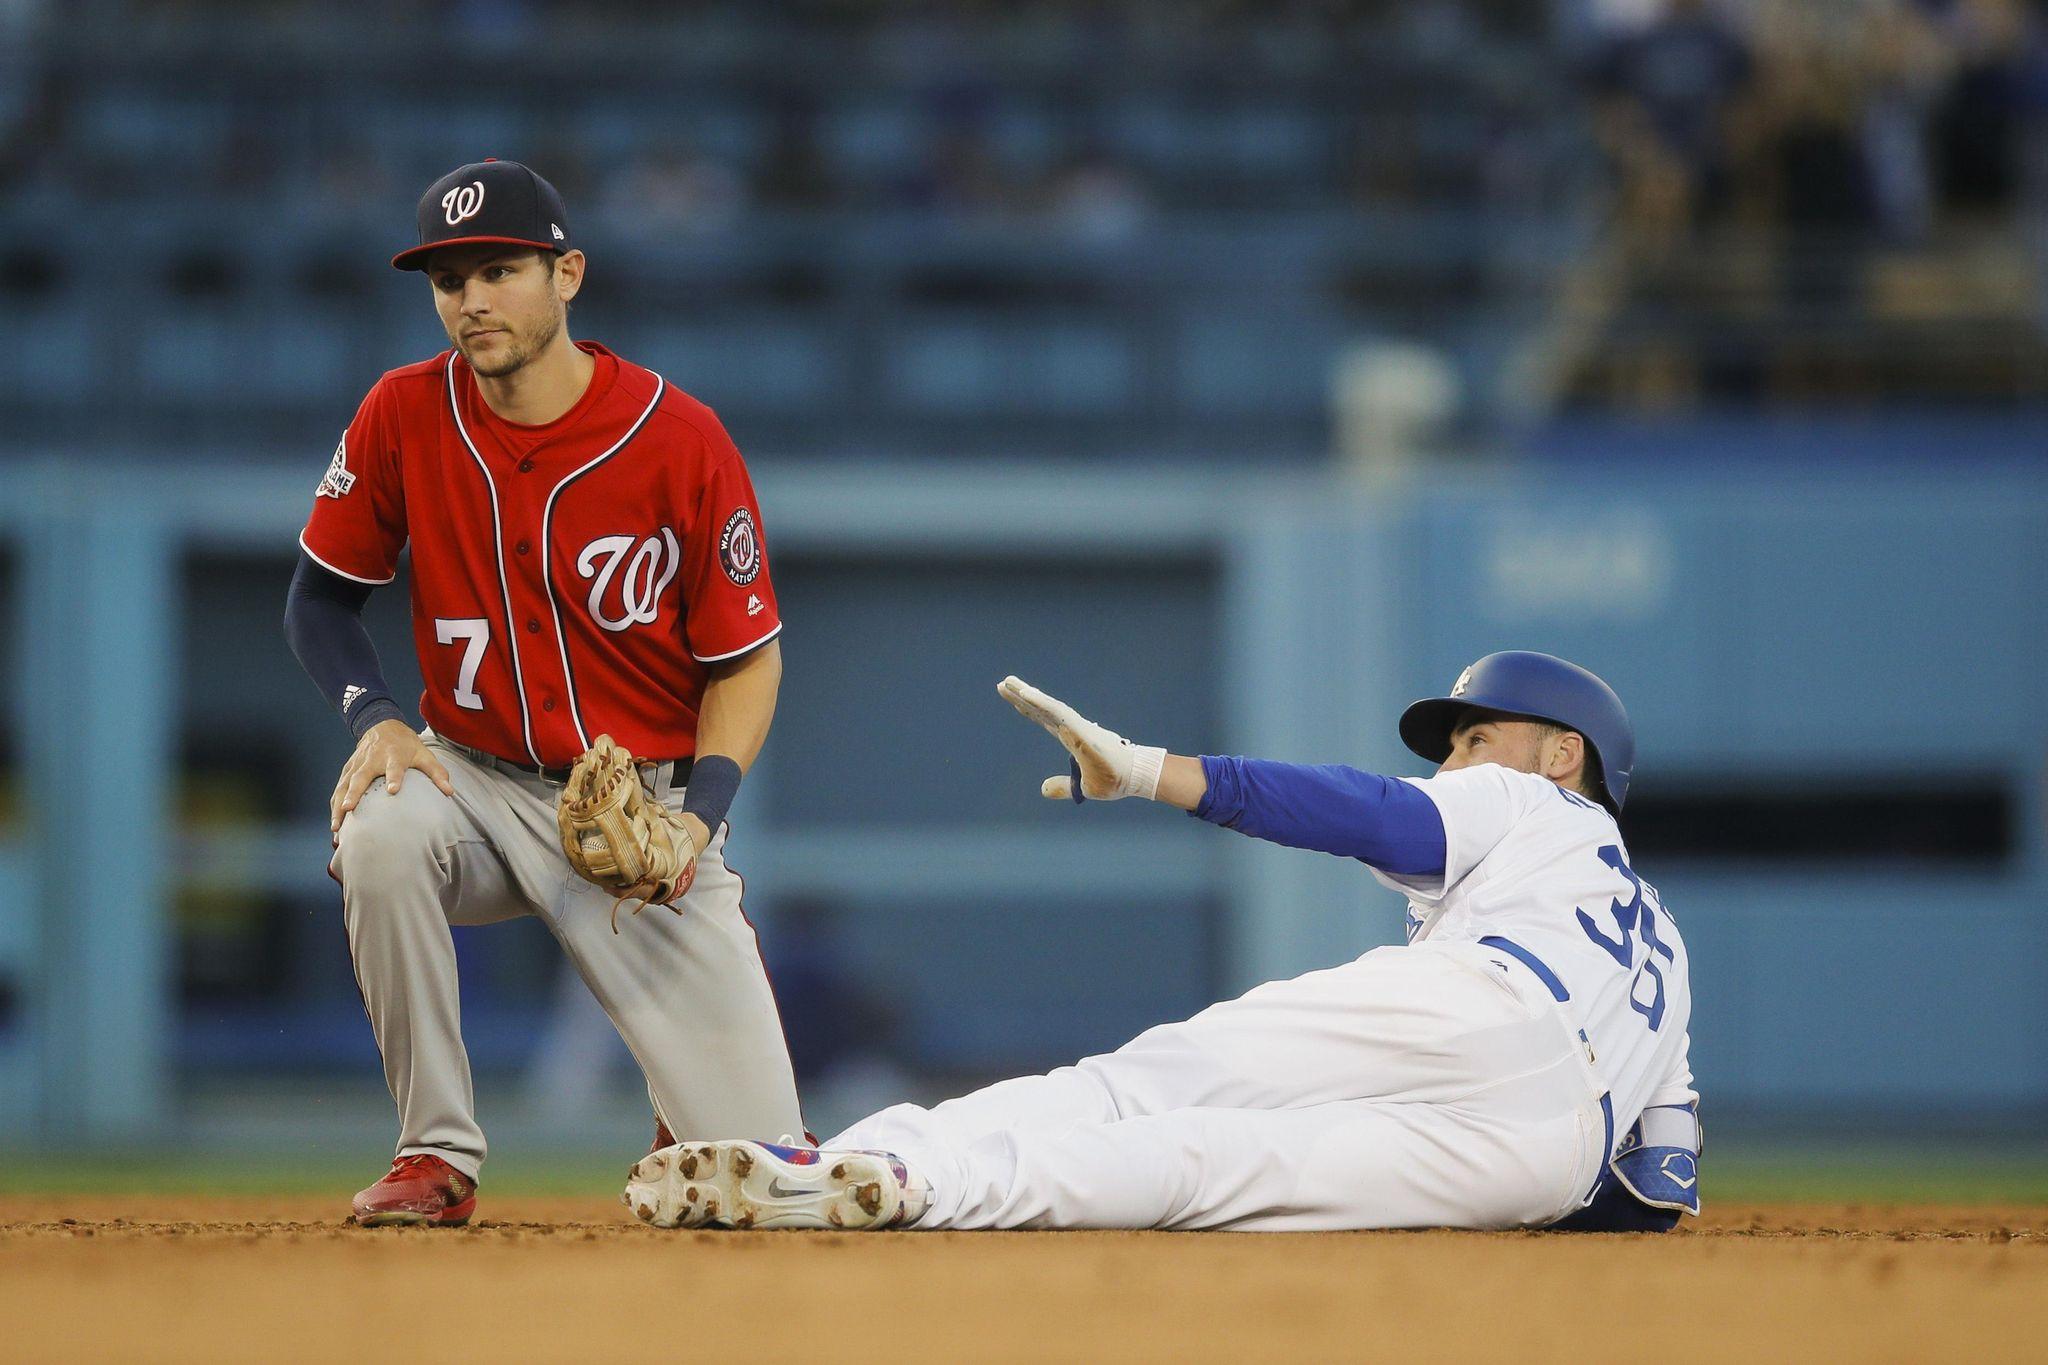 Nationals_dodgers_baseball_42091_s2048x1365